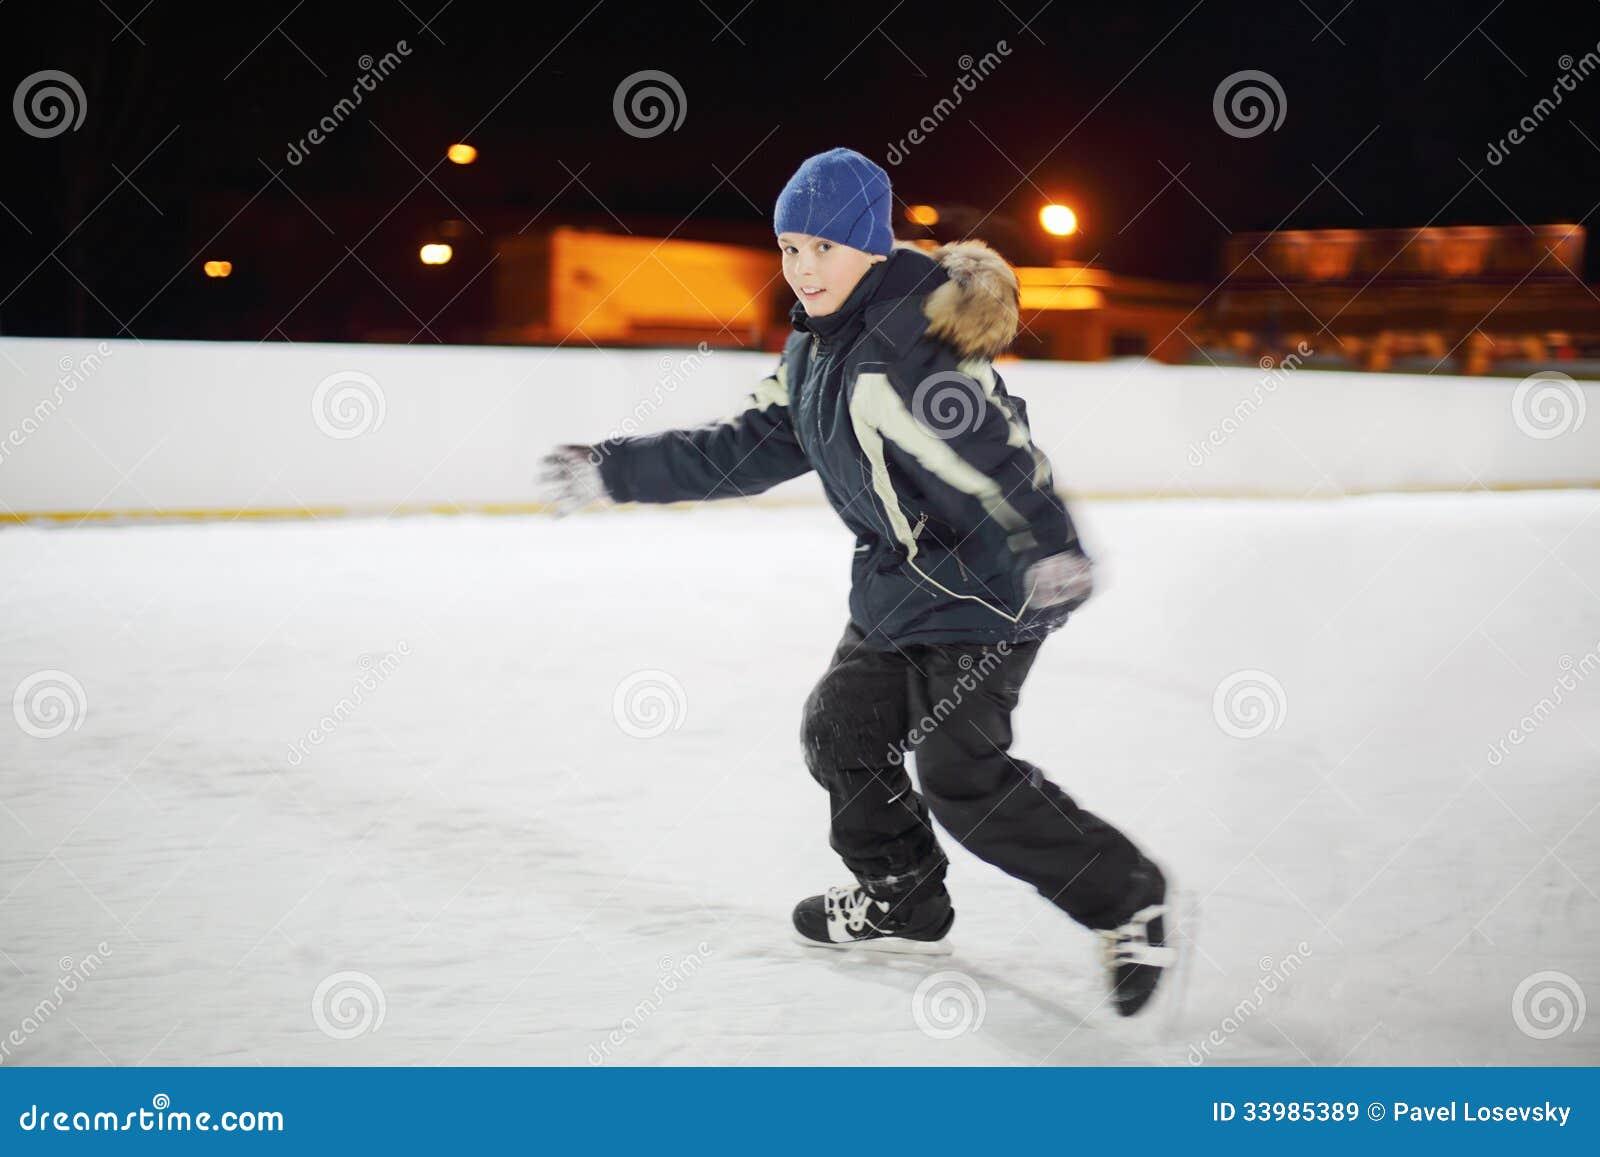 Happy boy wearing in black suit skates at night.